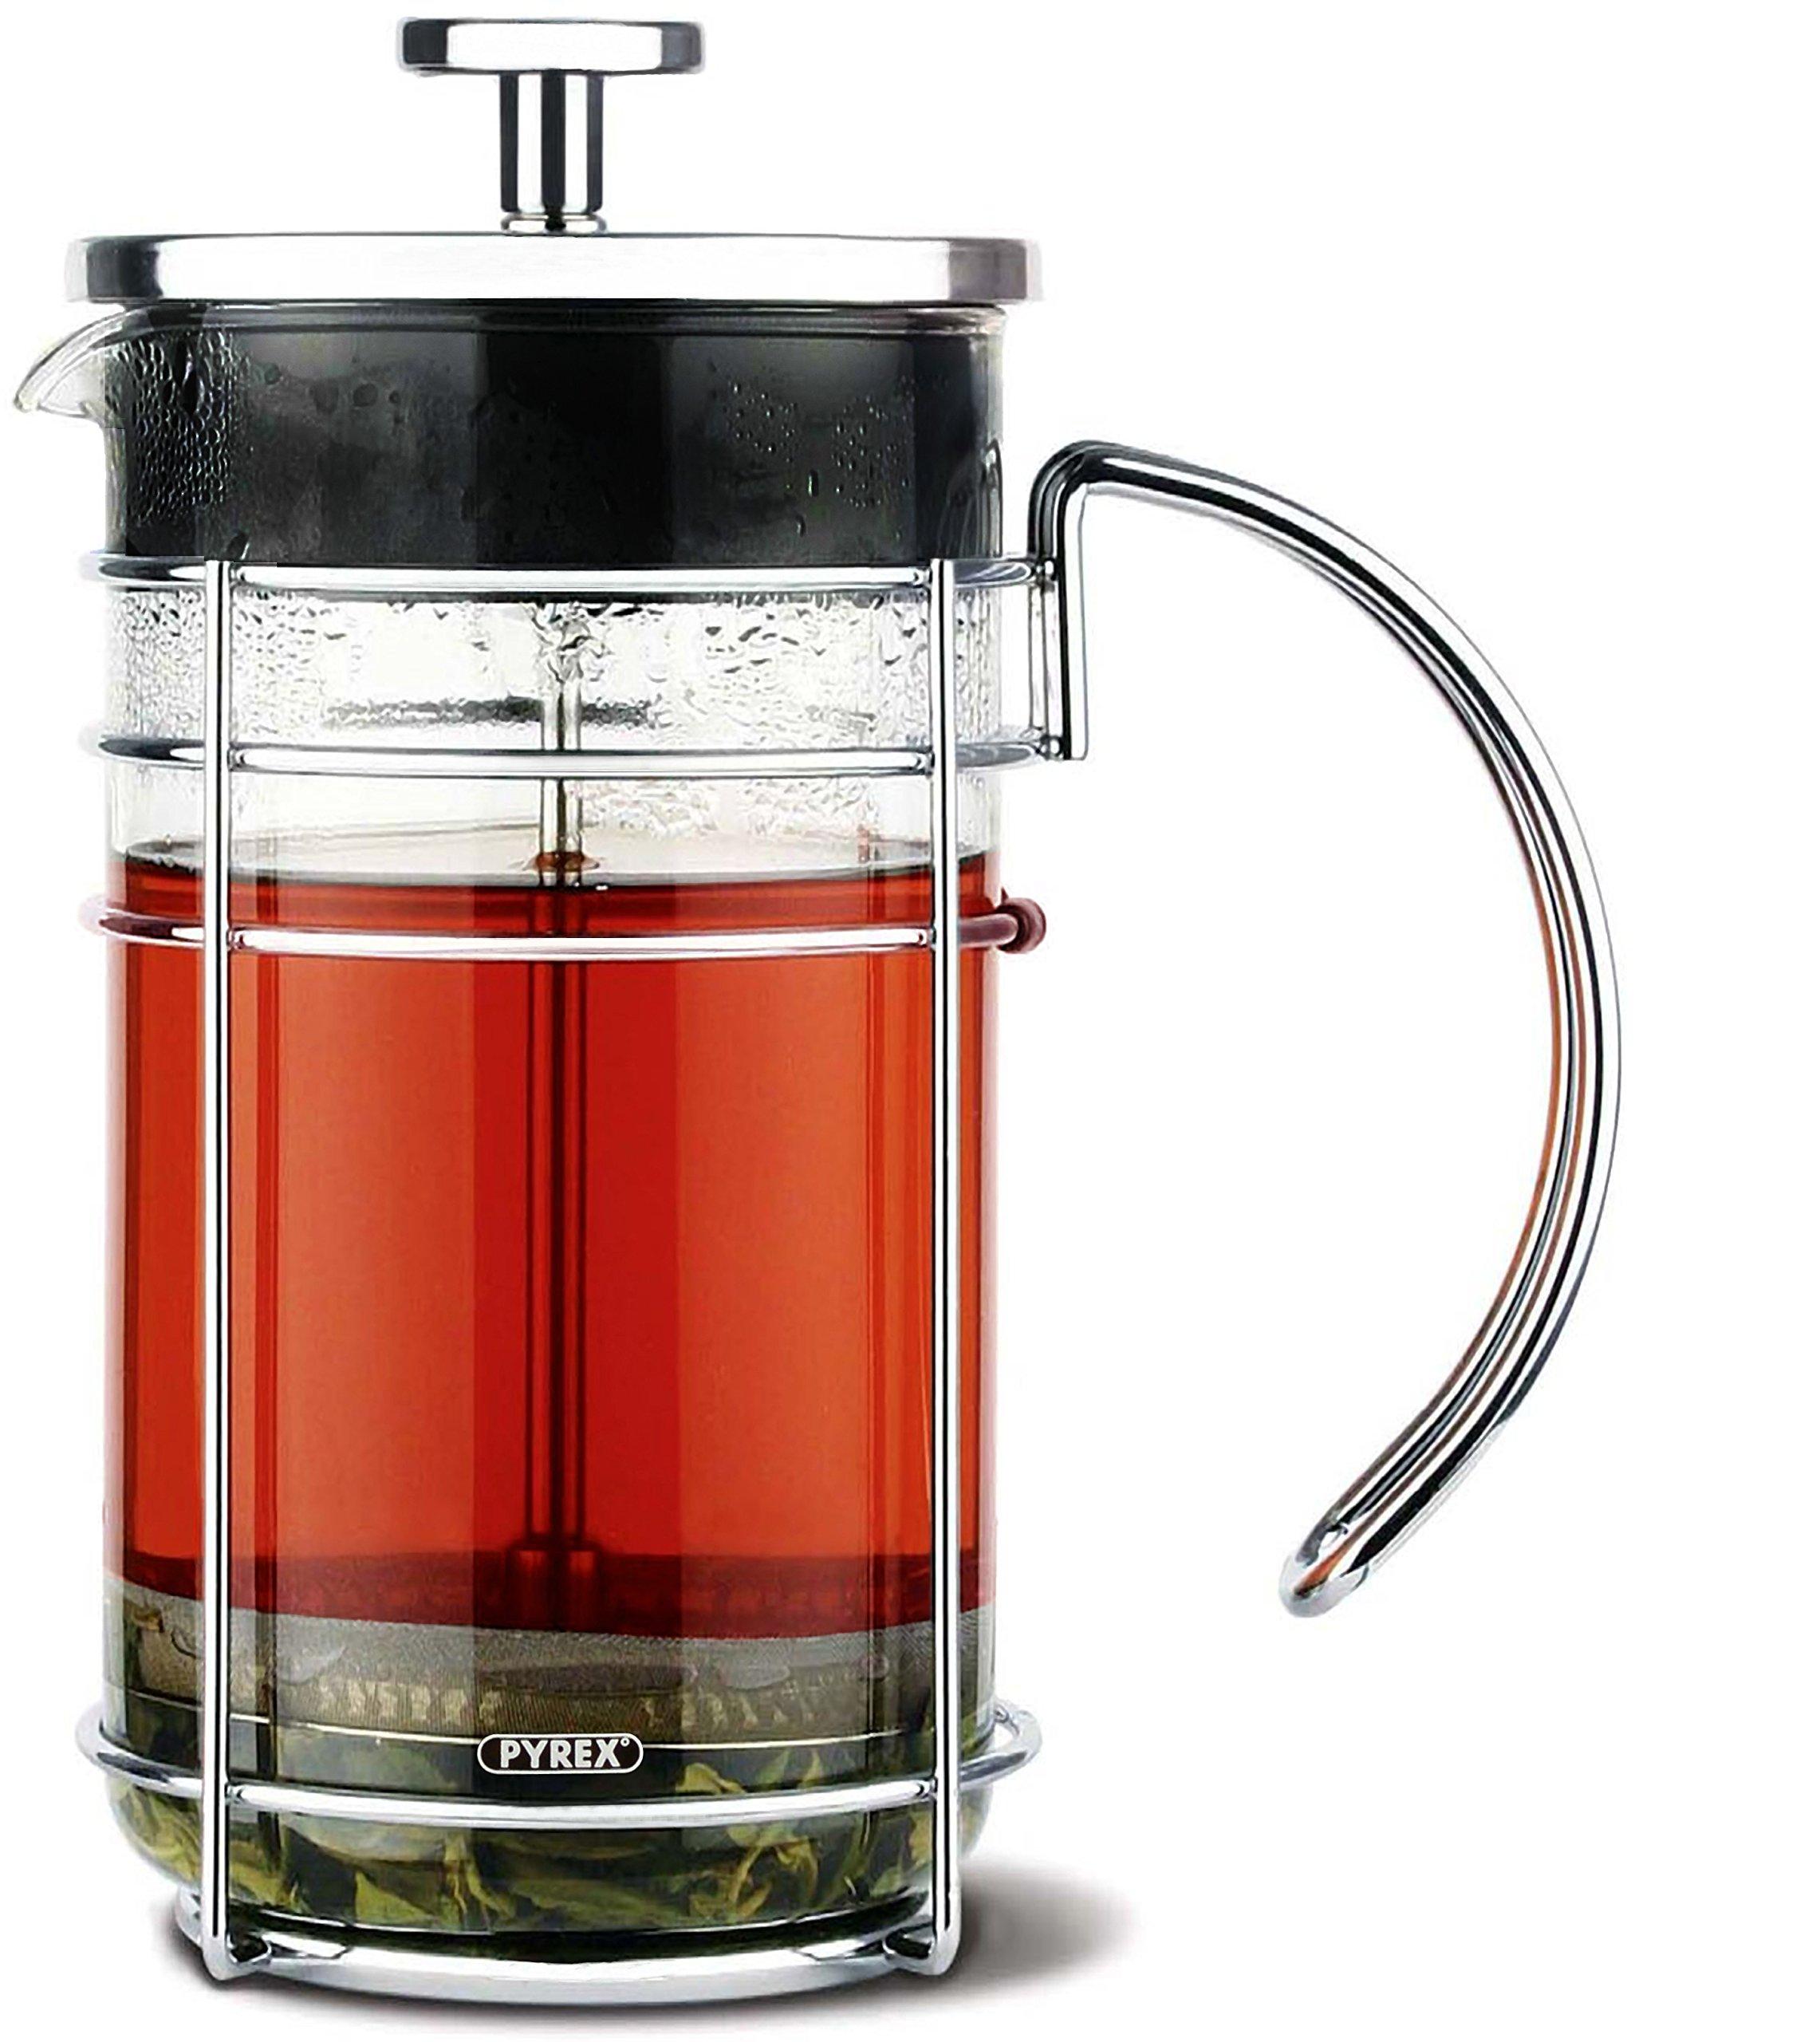 GROSCHE Madrid French Press Coffee Maker, Tea Press & Coffee Press 8 cup 34 oz 1L with Pyrex Glass